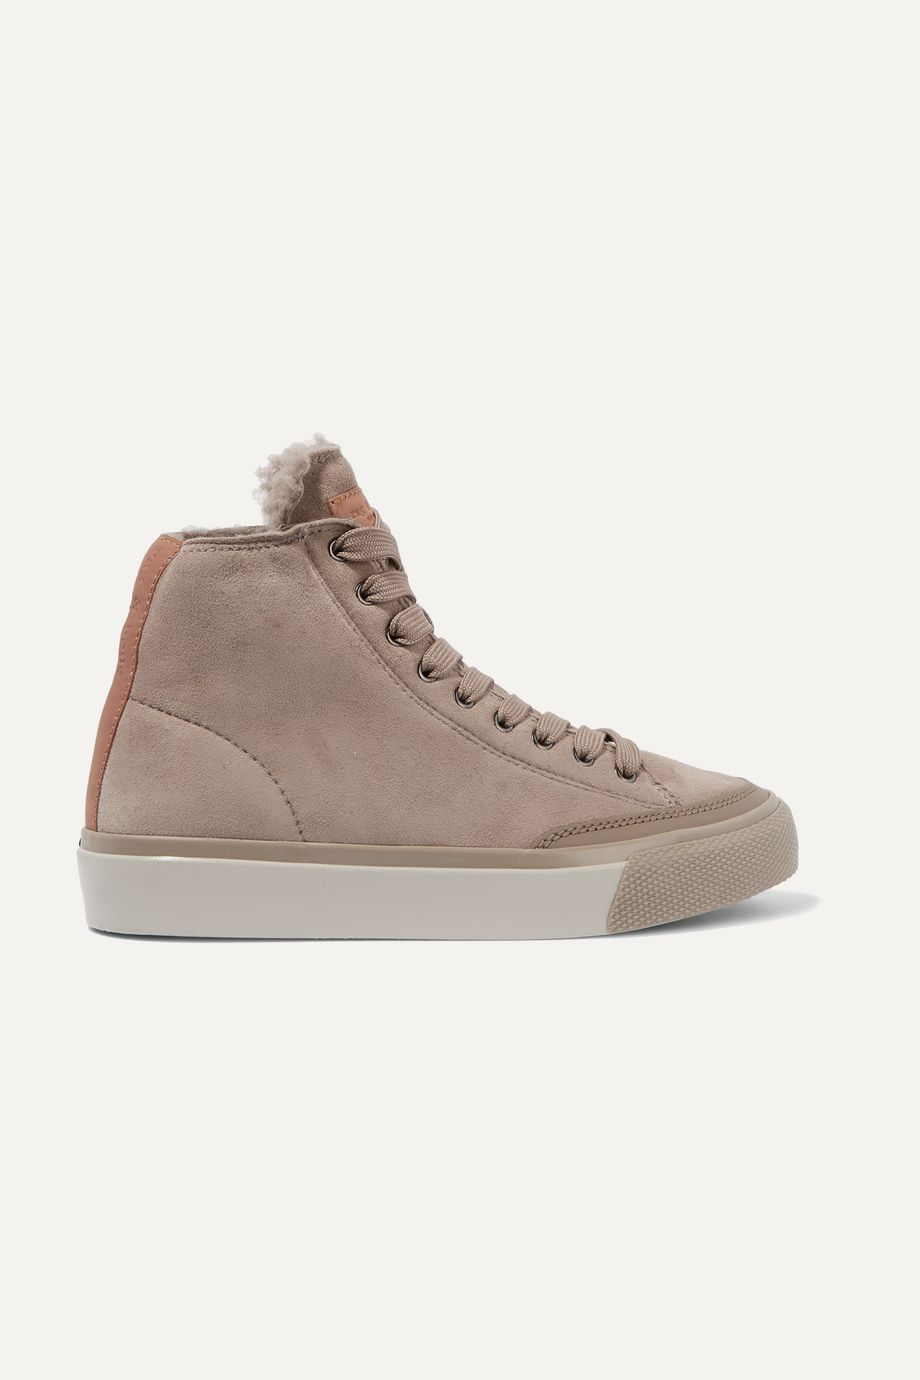 rag & bone RB shearling-lined suede sneakers